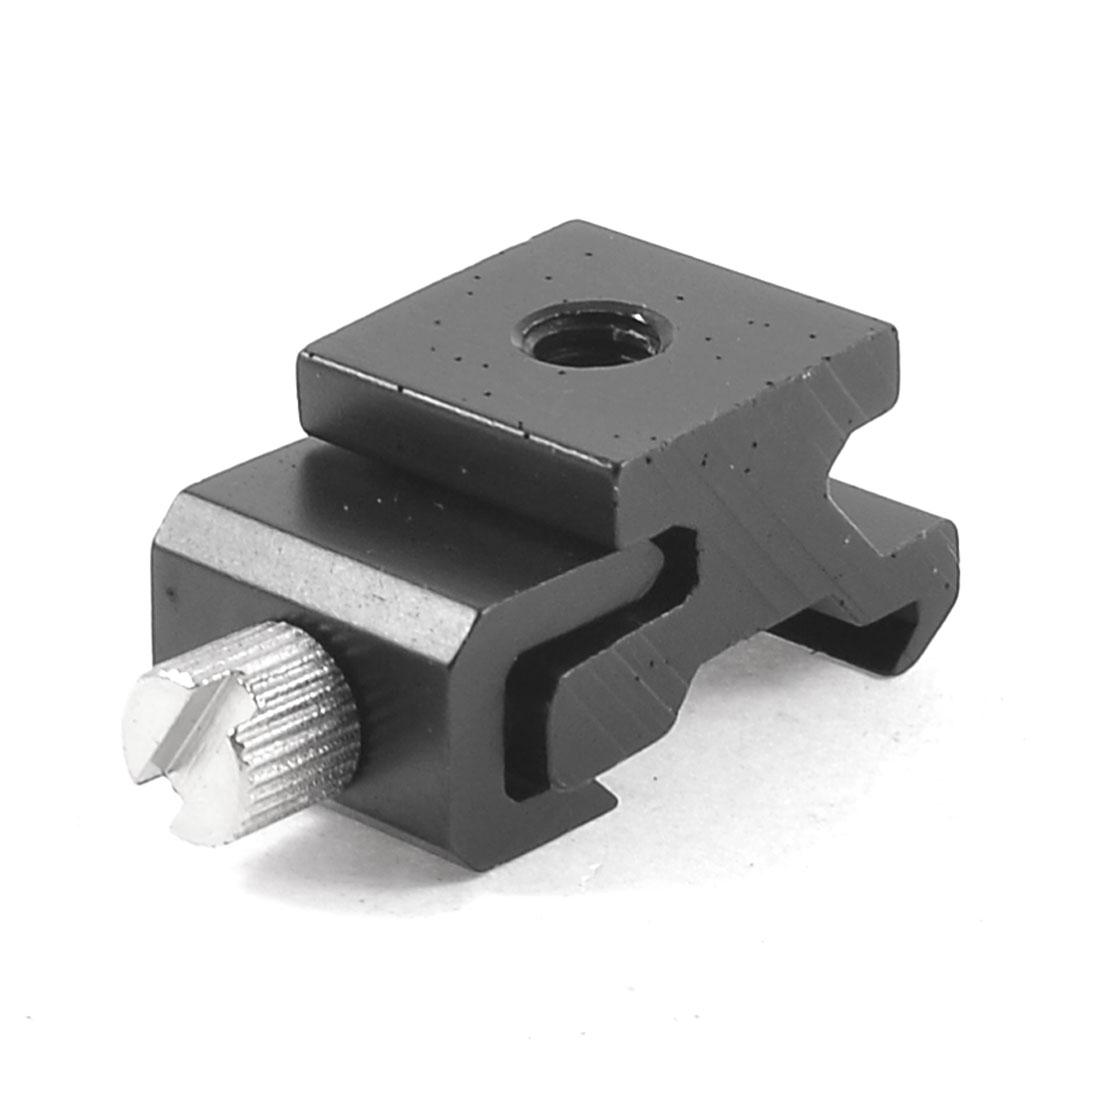 "Camera Flash Light Hot Shoe Stand Aluminum 1/4"" Thread Mount Adapter Black"